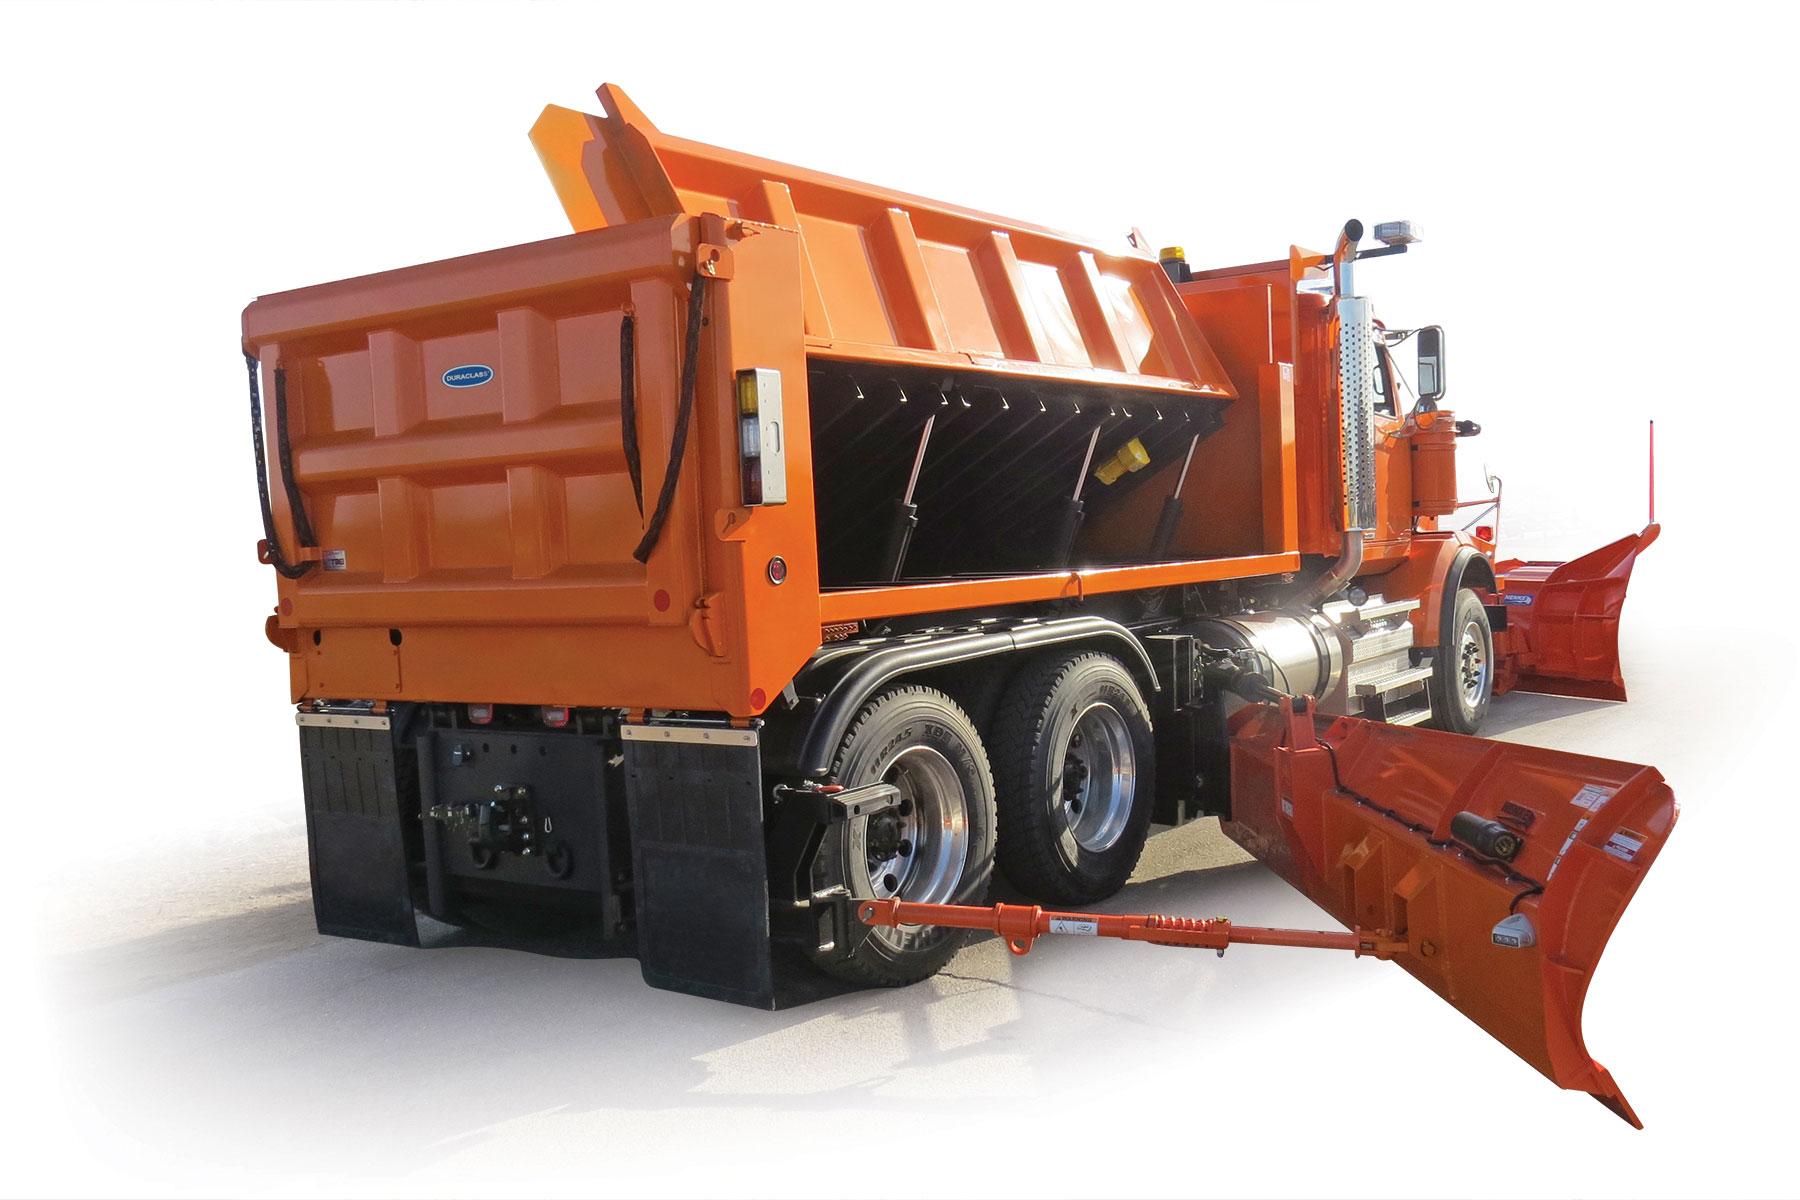 Sidewinder Dump Bodies From Duraclass Public Works